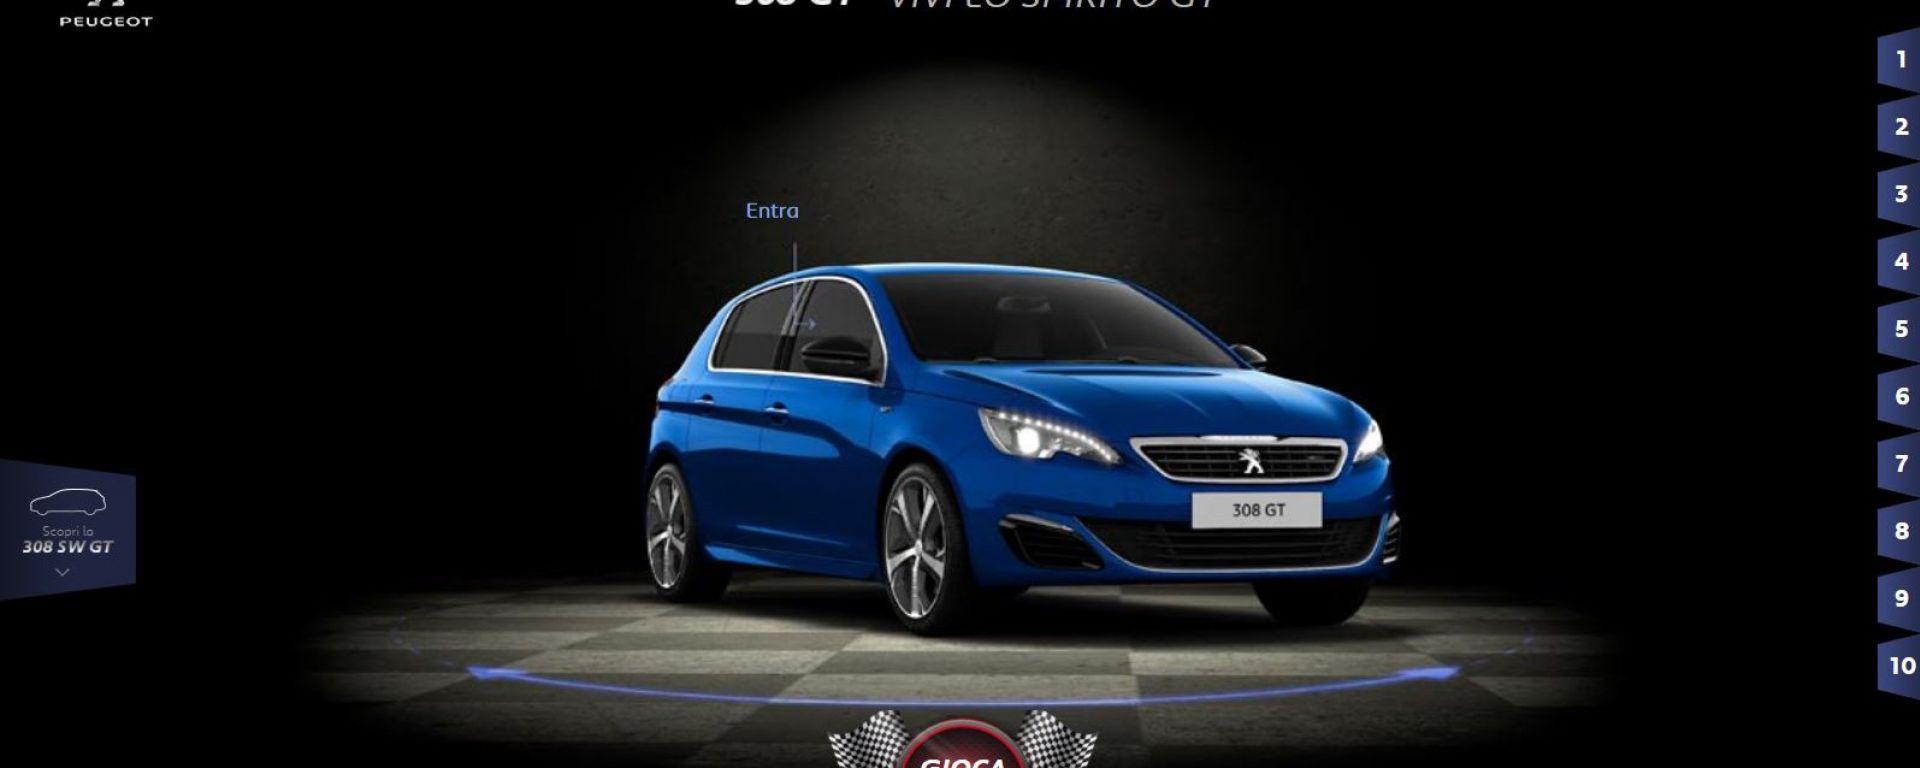 Peugeot: Vivi lo spirito GT